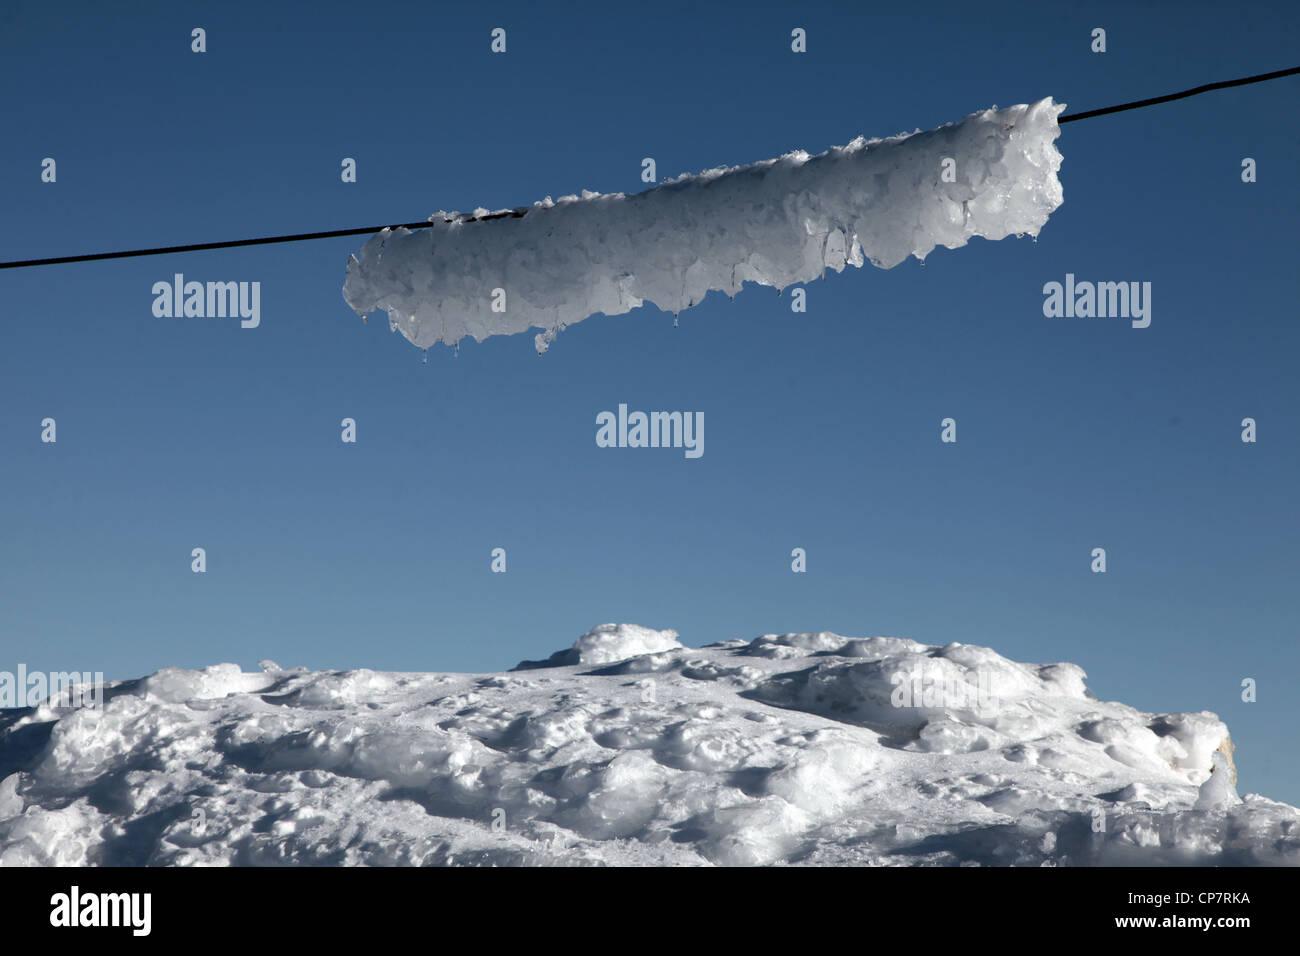 SNOW ON WIRE UNTERSBERG MOUNTAIN AUSTRIA 28 December 2011 - Stock Image